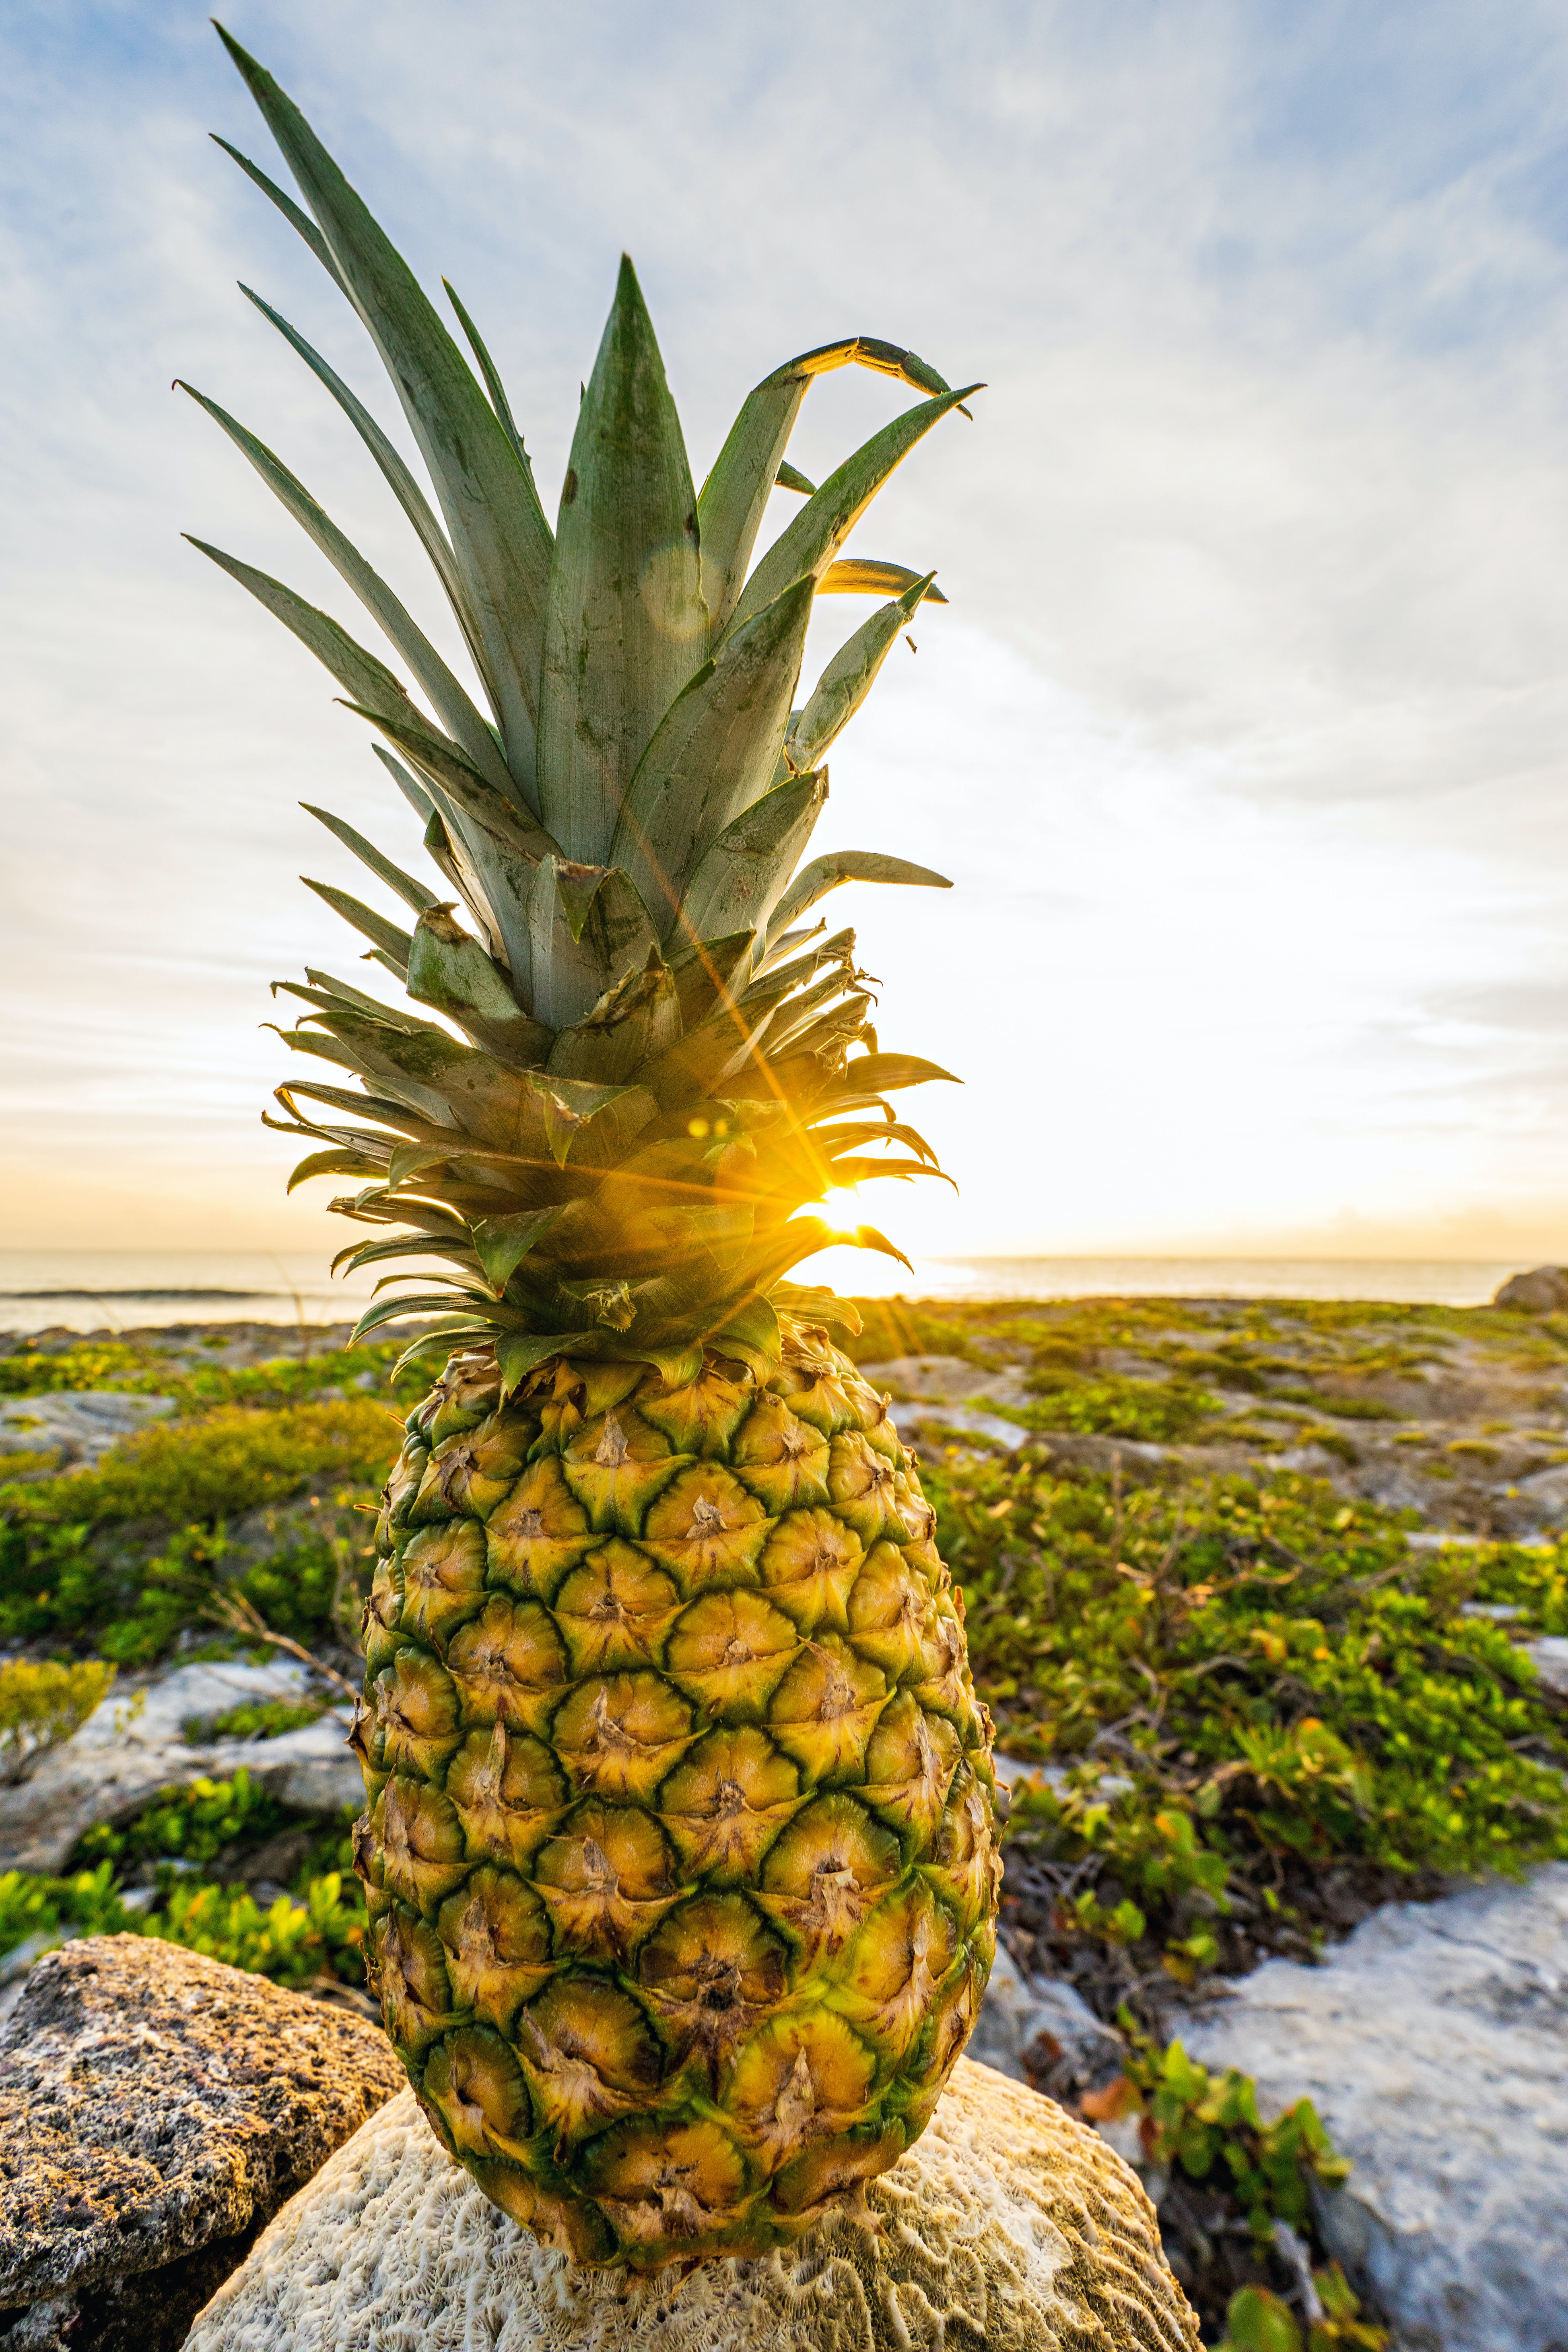 Gratis arkivbilde med ananas, farger, himmel, klar